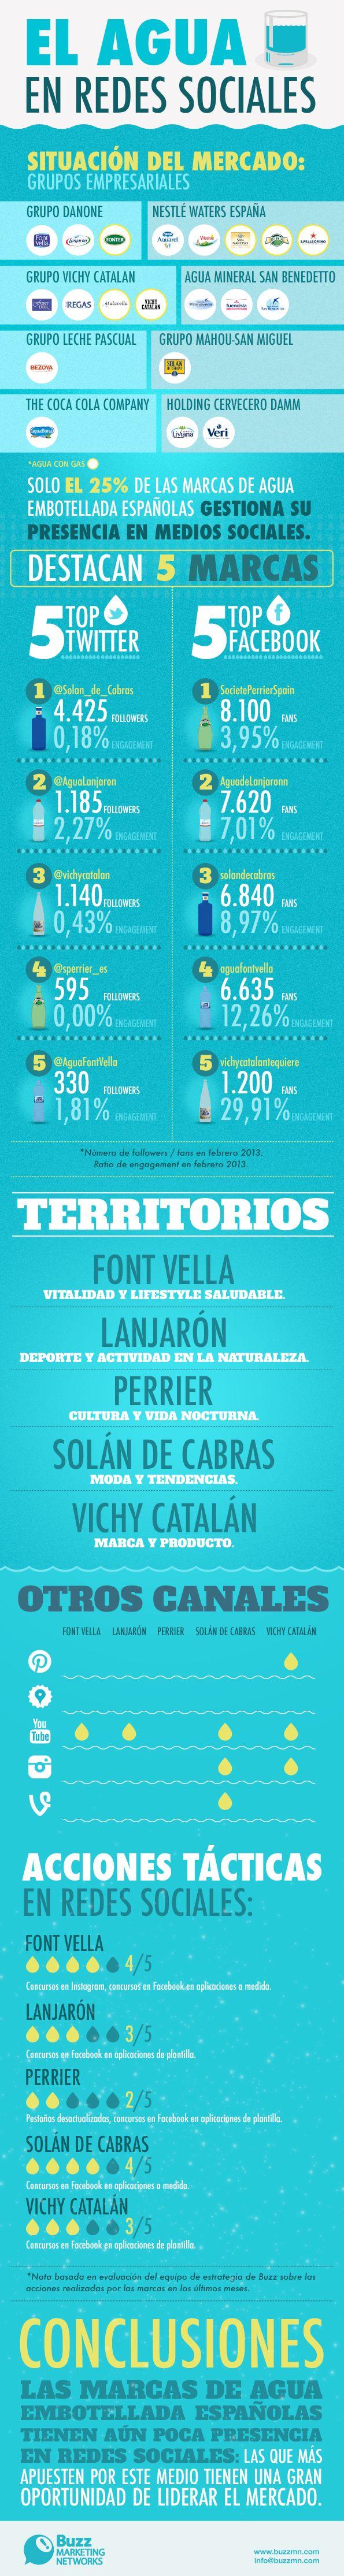 #Infografía marcas de agua embotellada en #redessociales en España [Buzz Marketing Networks]